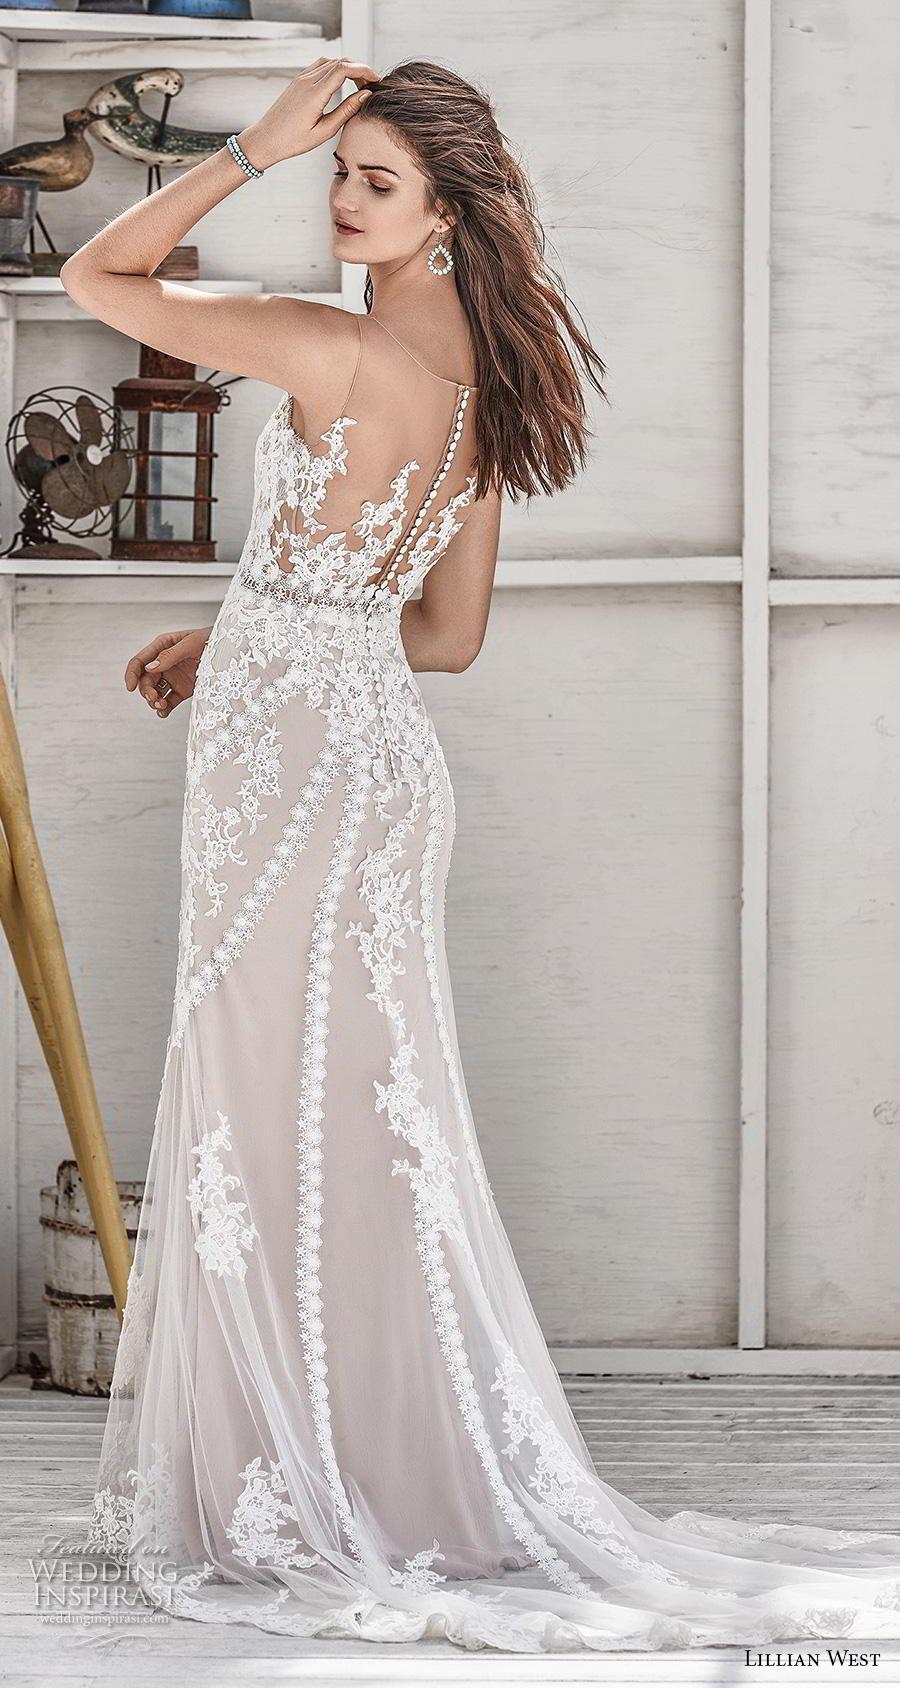 lillian west spring 2019 bridal sleeveless with strap v neck full embellishment elegant blush fit and flare sheath wedding dress sheer button back medium train (4) bv